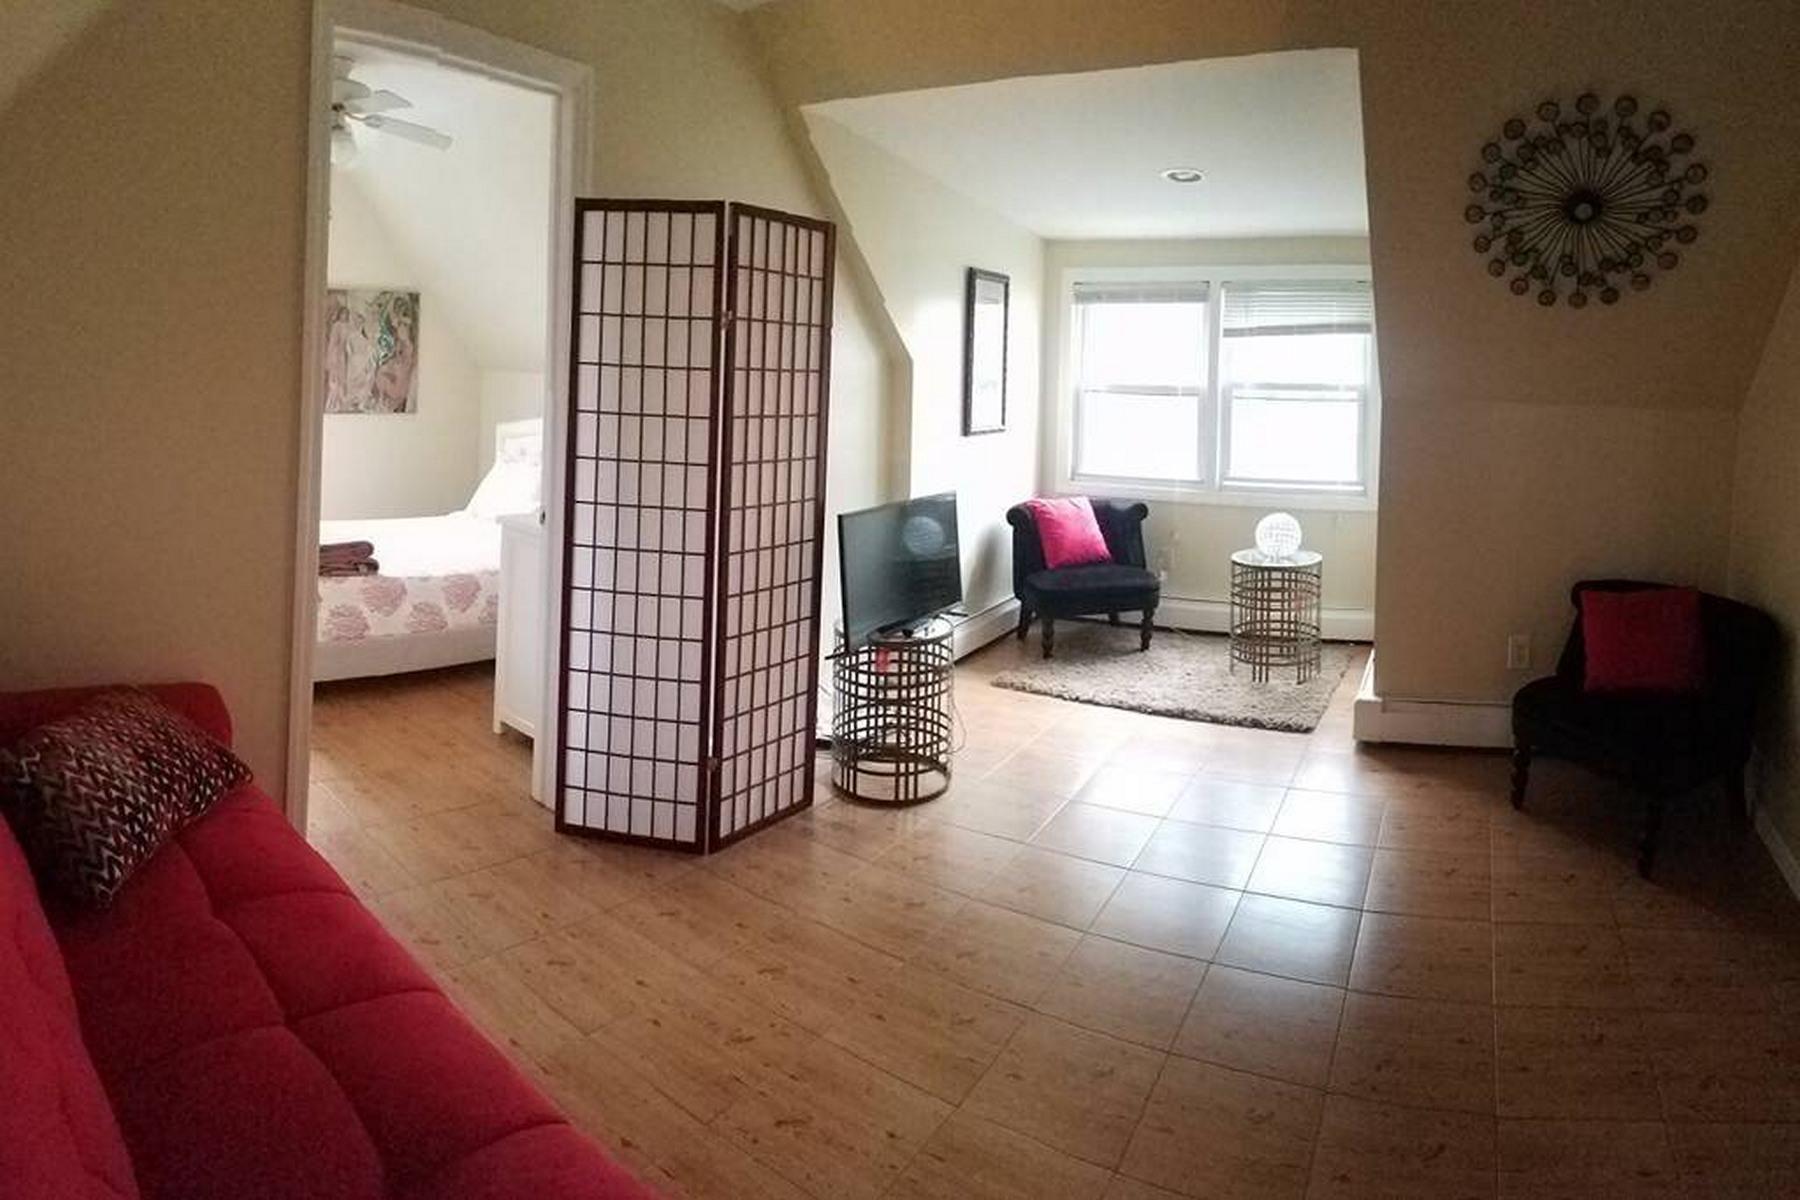 Apartamento por un Alquiler en Beautiful & bright 3rd floor apartment with hardwood floors and lovely decor 209 50th Street #3 West New York, Nueva Jersey 07093 Estados Unidos